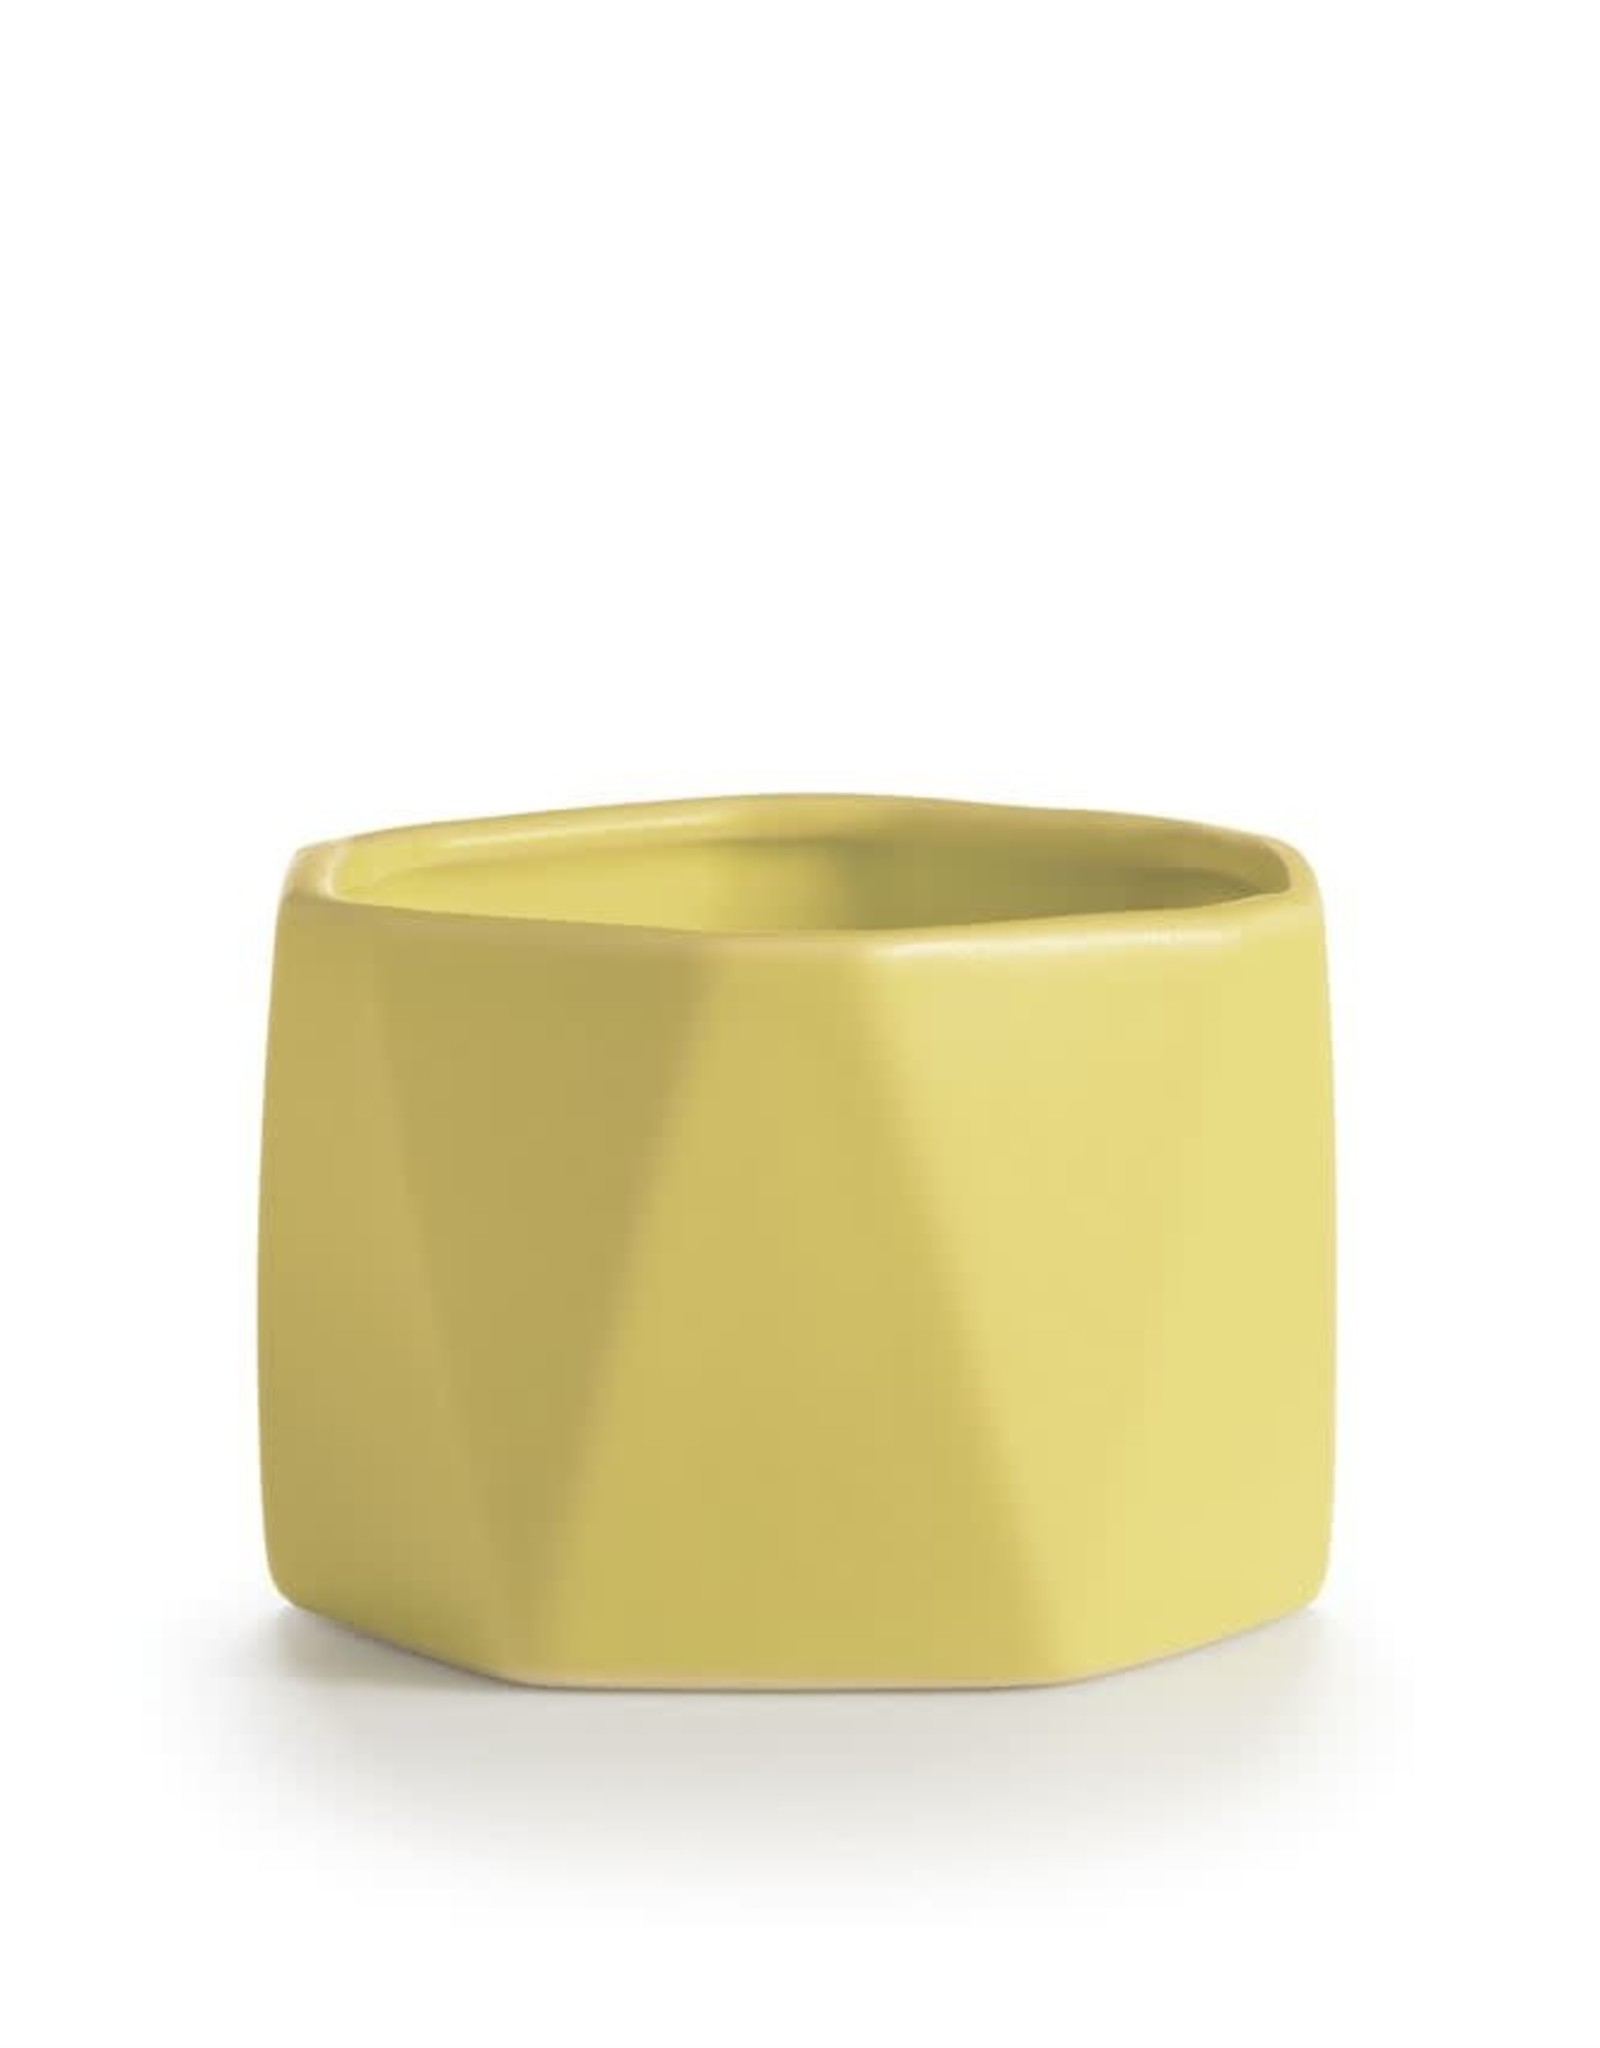 Pineapple Cilantro Candle